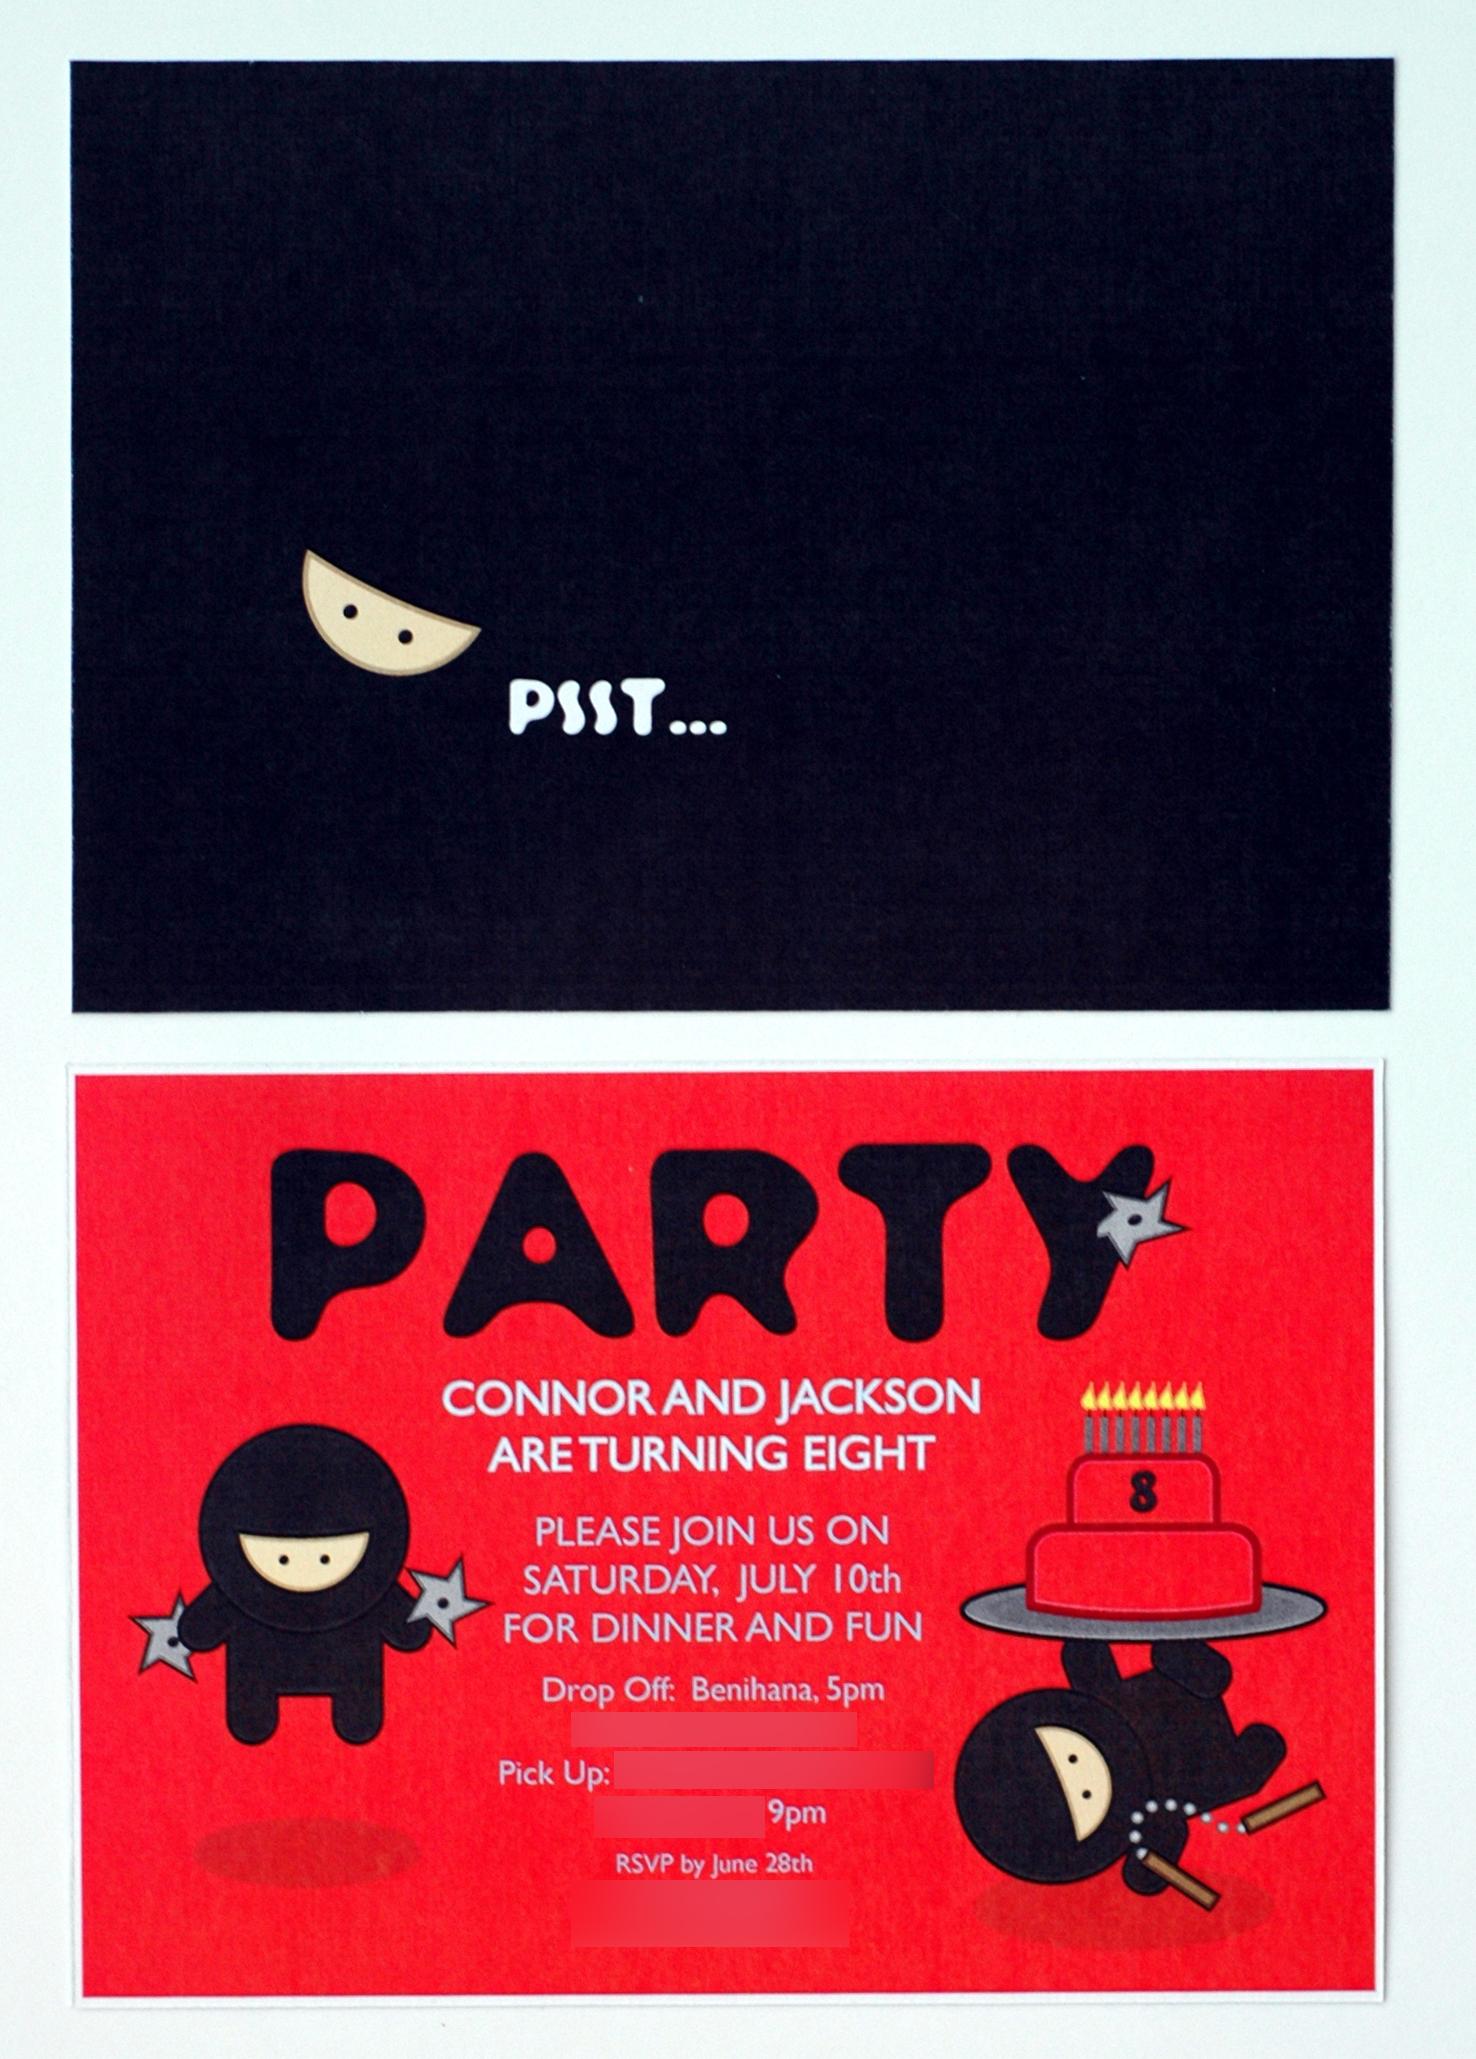 Ninja/Samurai Party Invitations - Bunny Cakes